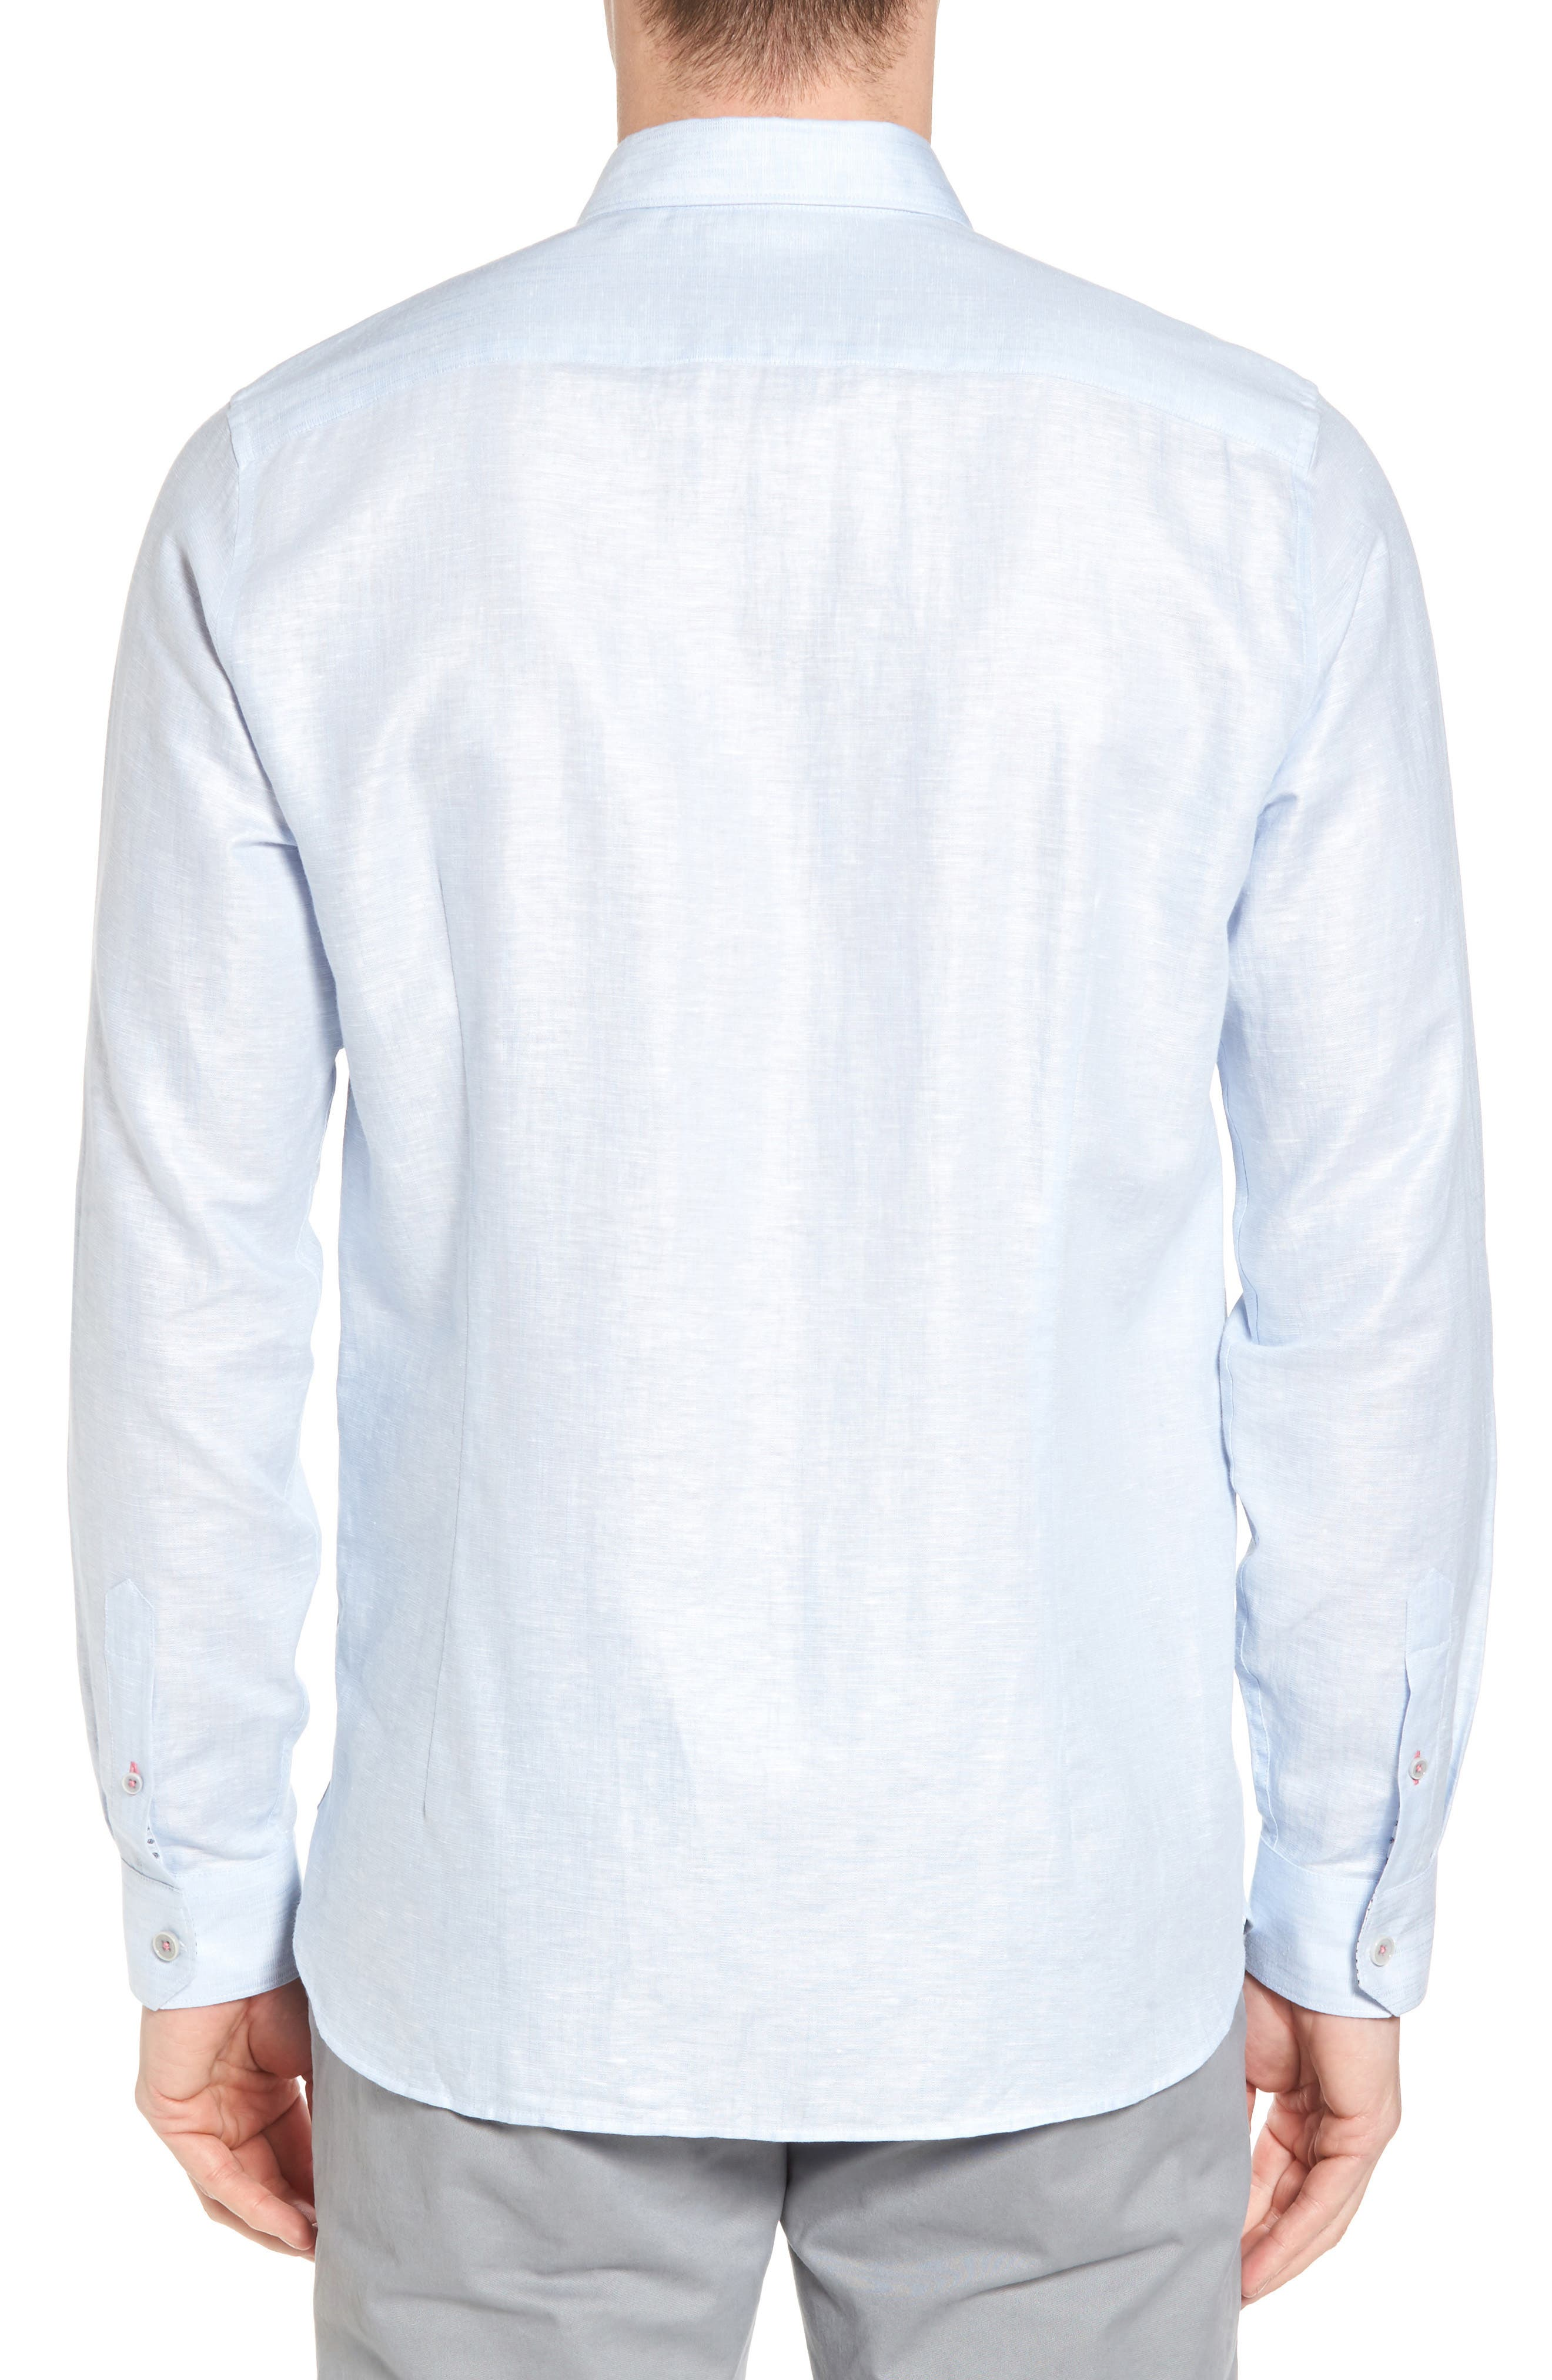 Linlins Herringbone Cotton & Linen Sport Shirt,                             Alternate thumbnail 8, color,